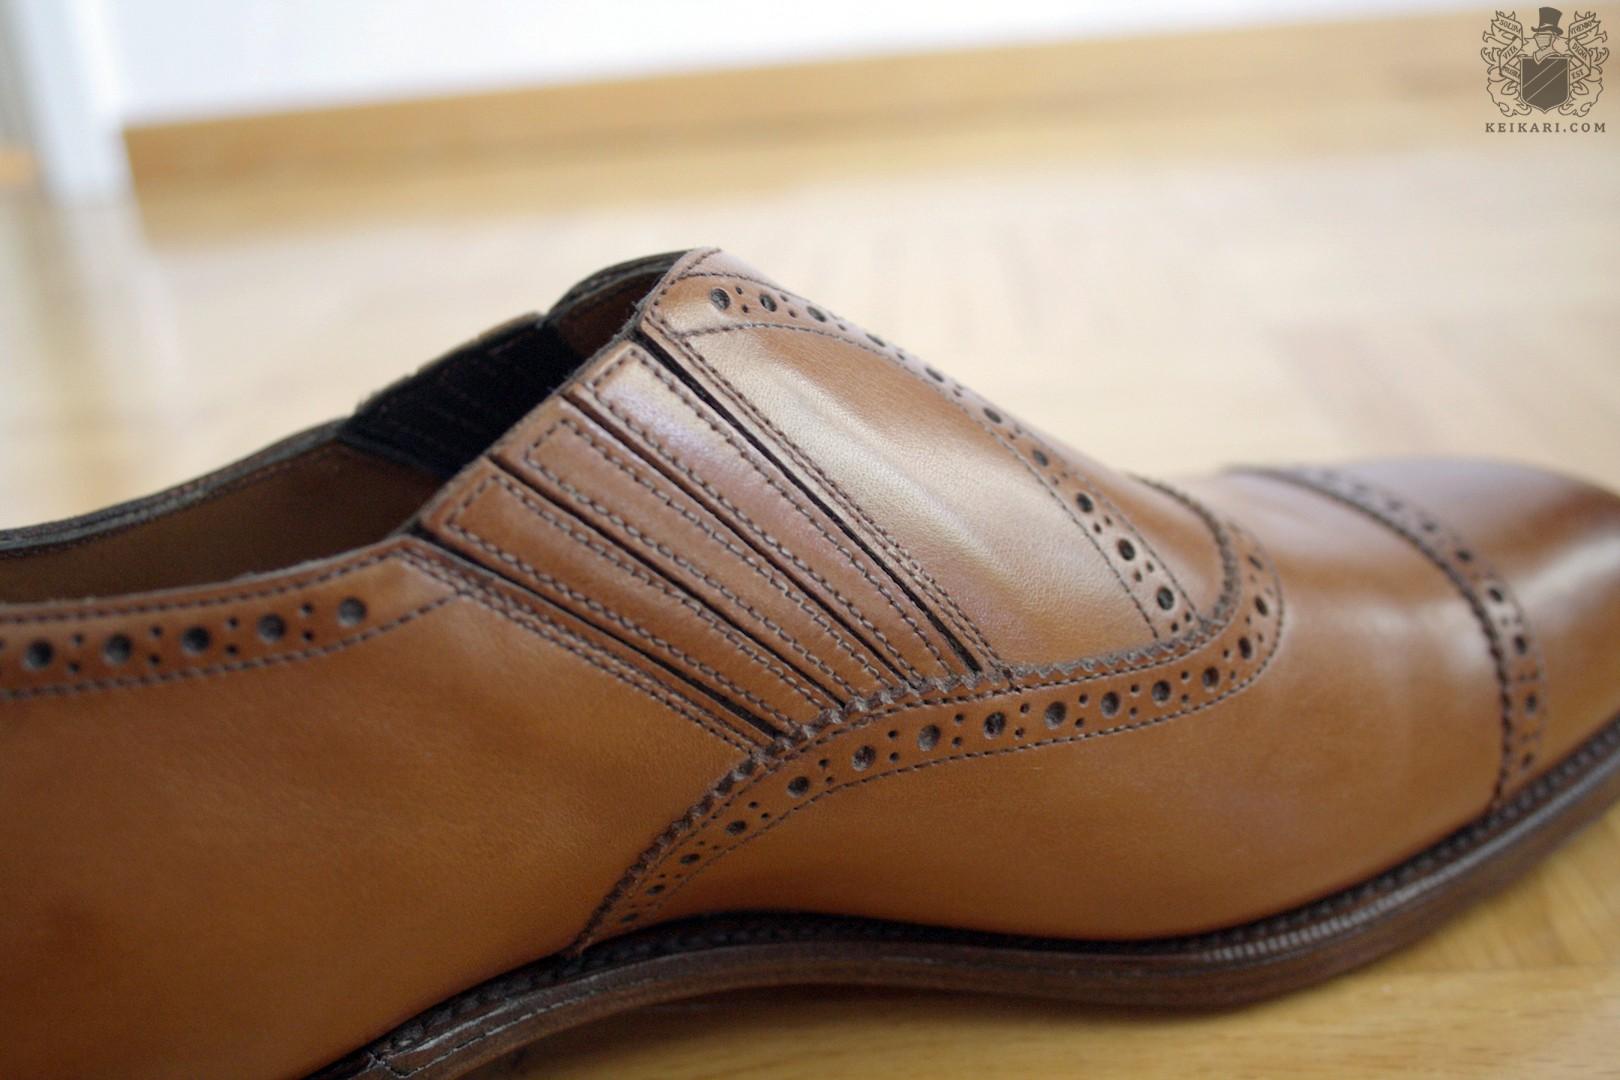 edward_green_kibworth_side_elastic_shoes_at_keikari_dot_com10